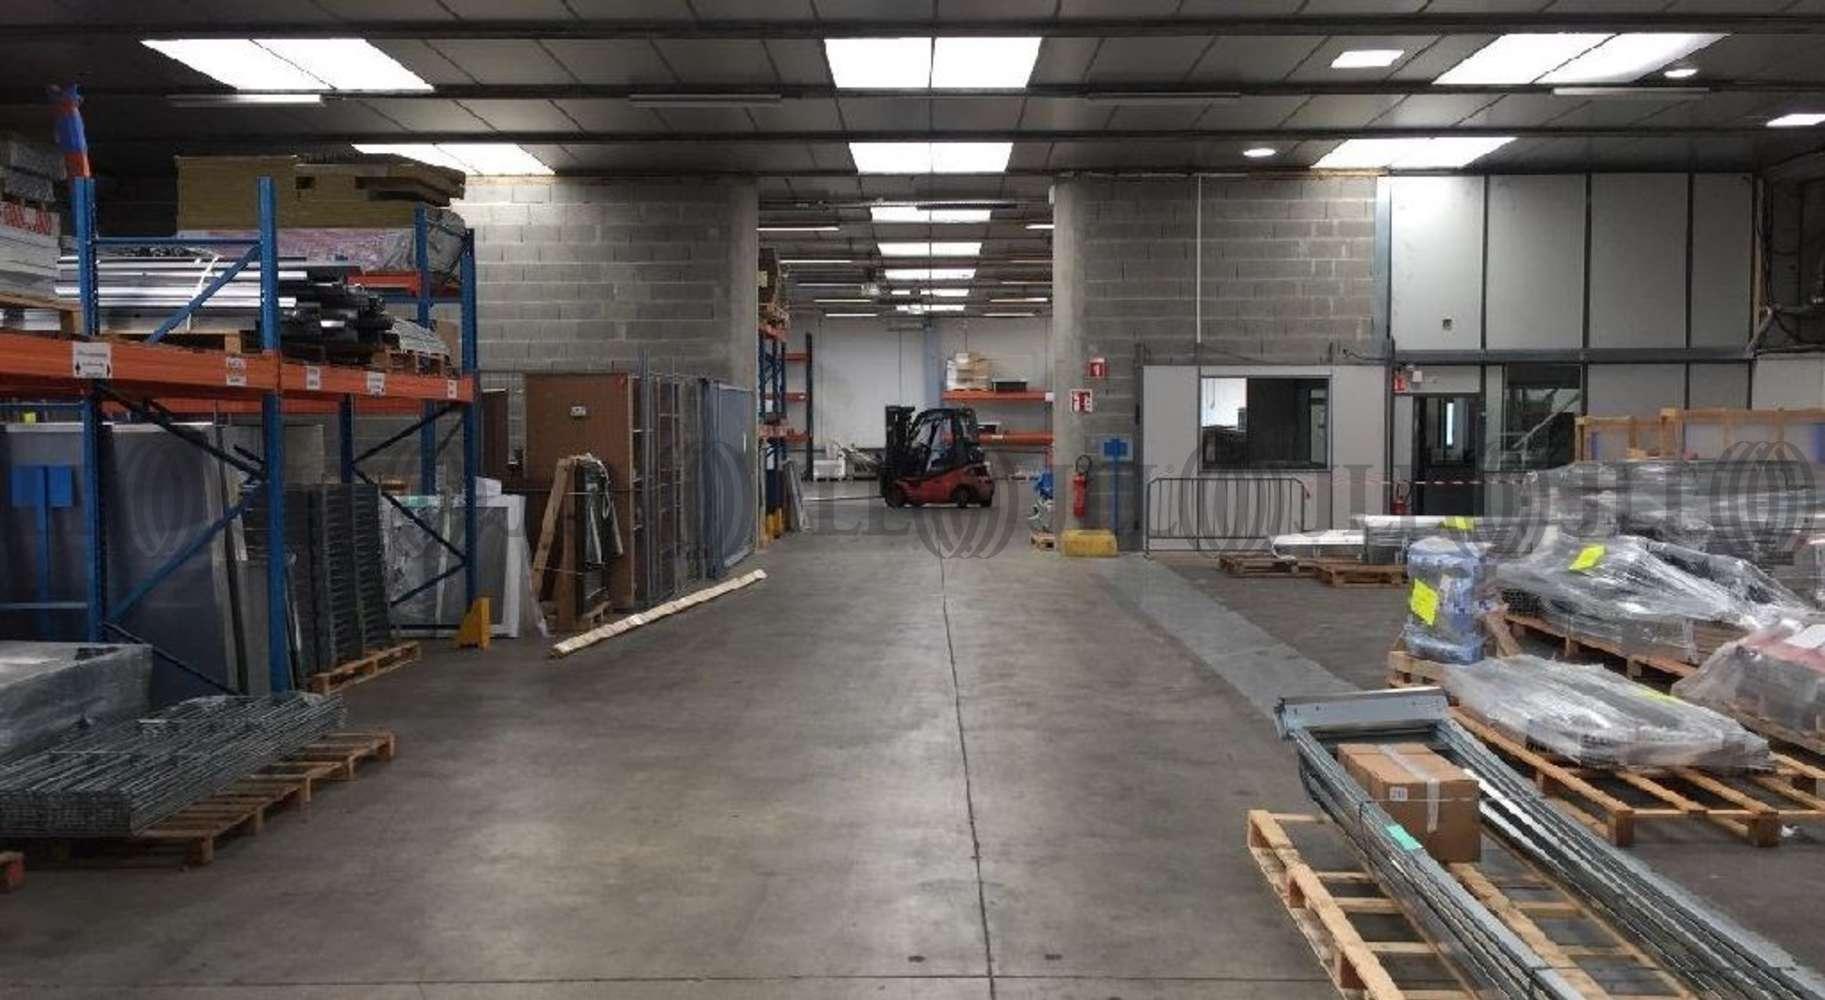 Activités/entrepôt Chaponnay, 69970 - BÂTIMENT MIXTE LYON SUD - CHAPONNAY - 9531899